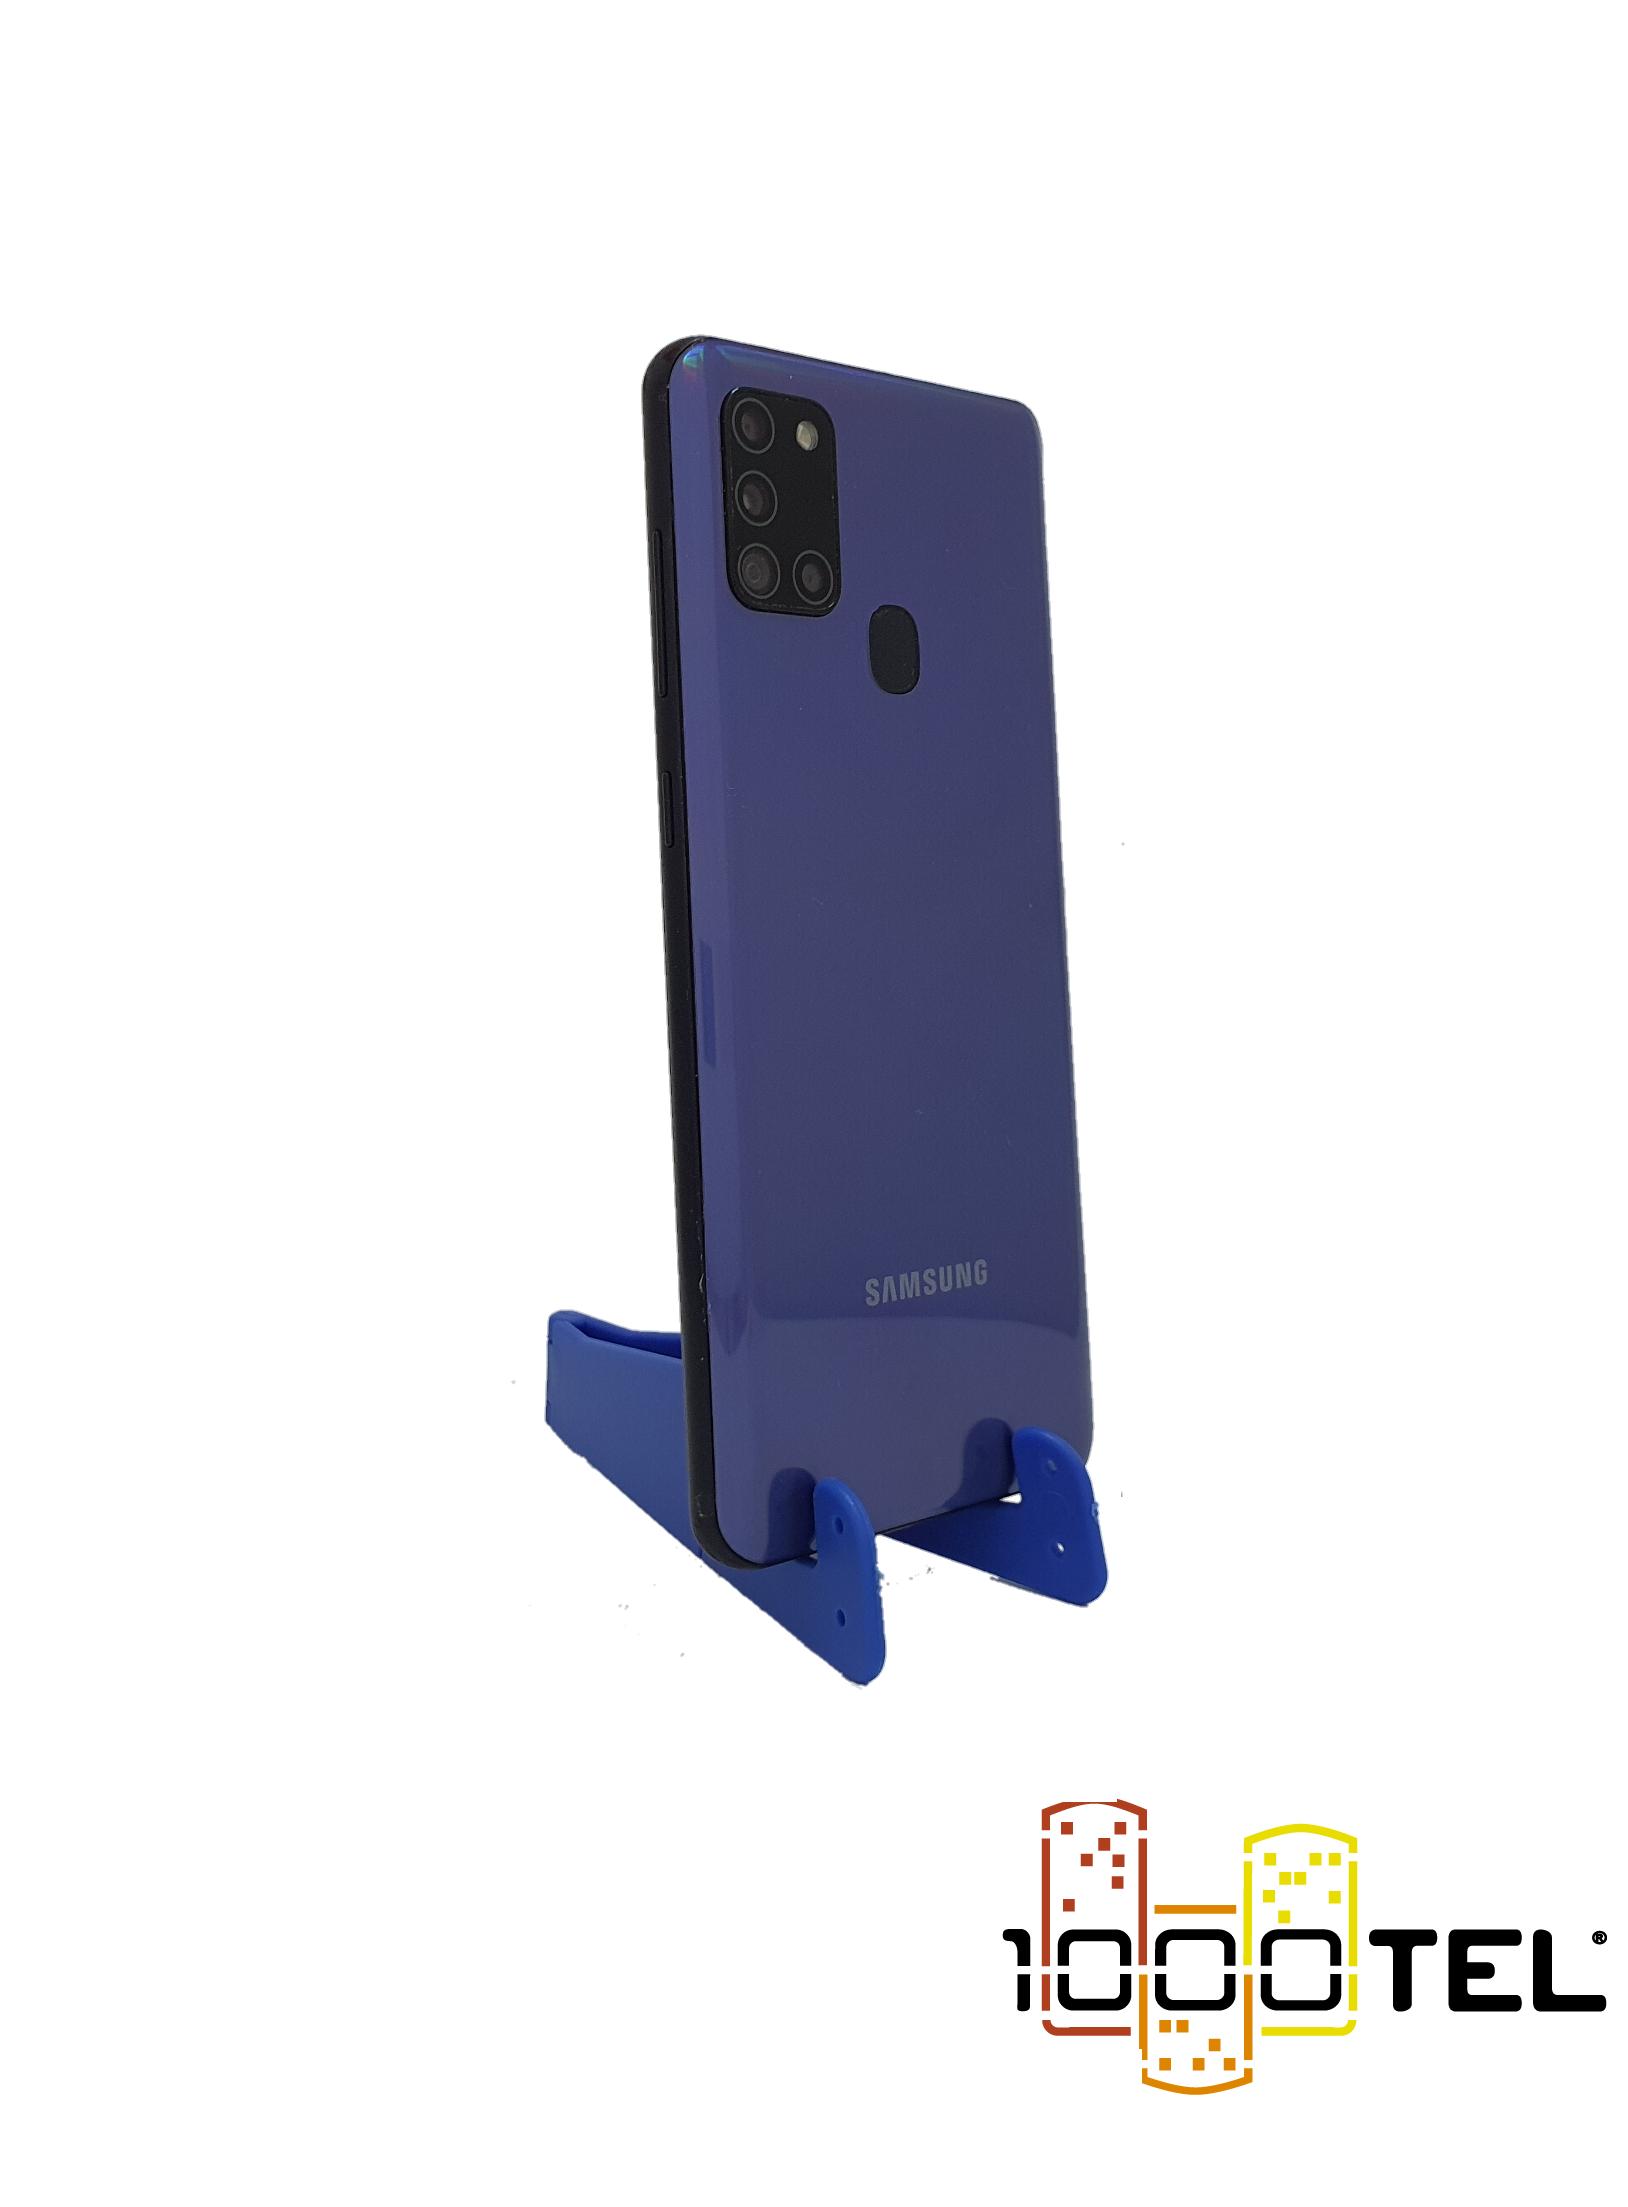 Samsung Galaxy A21s #3